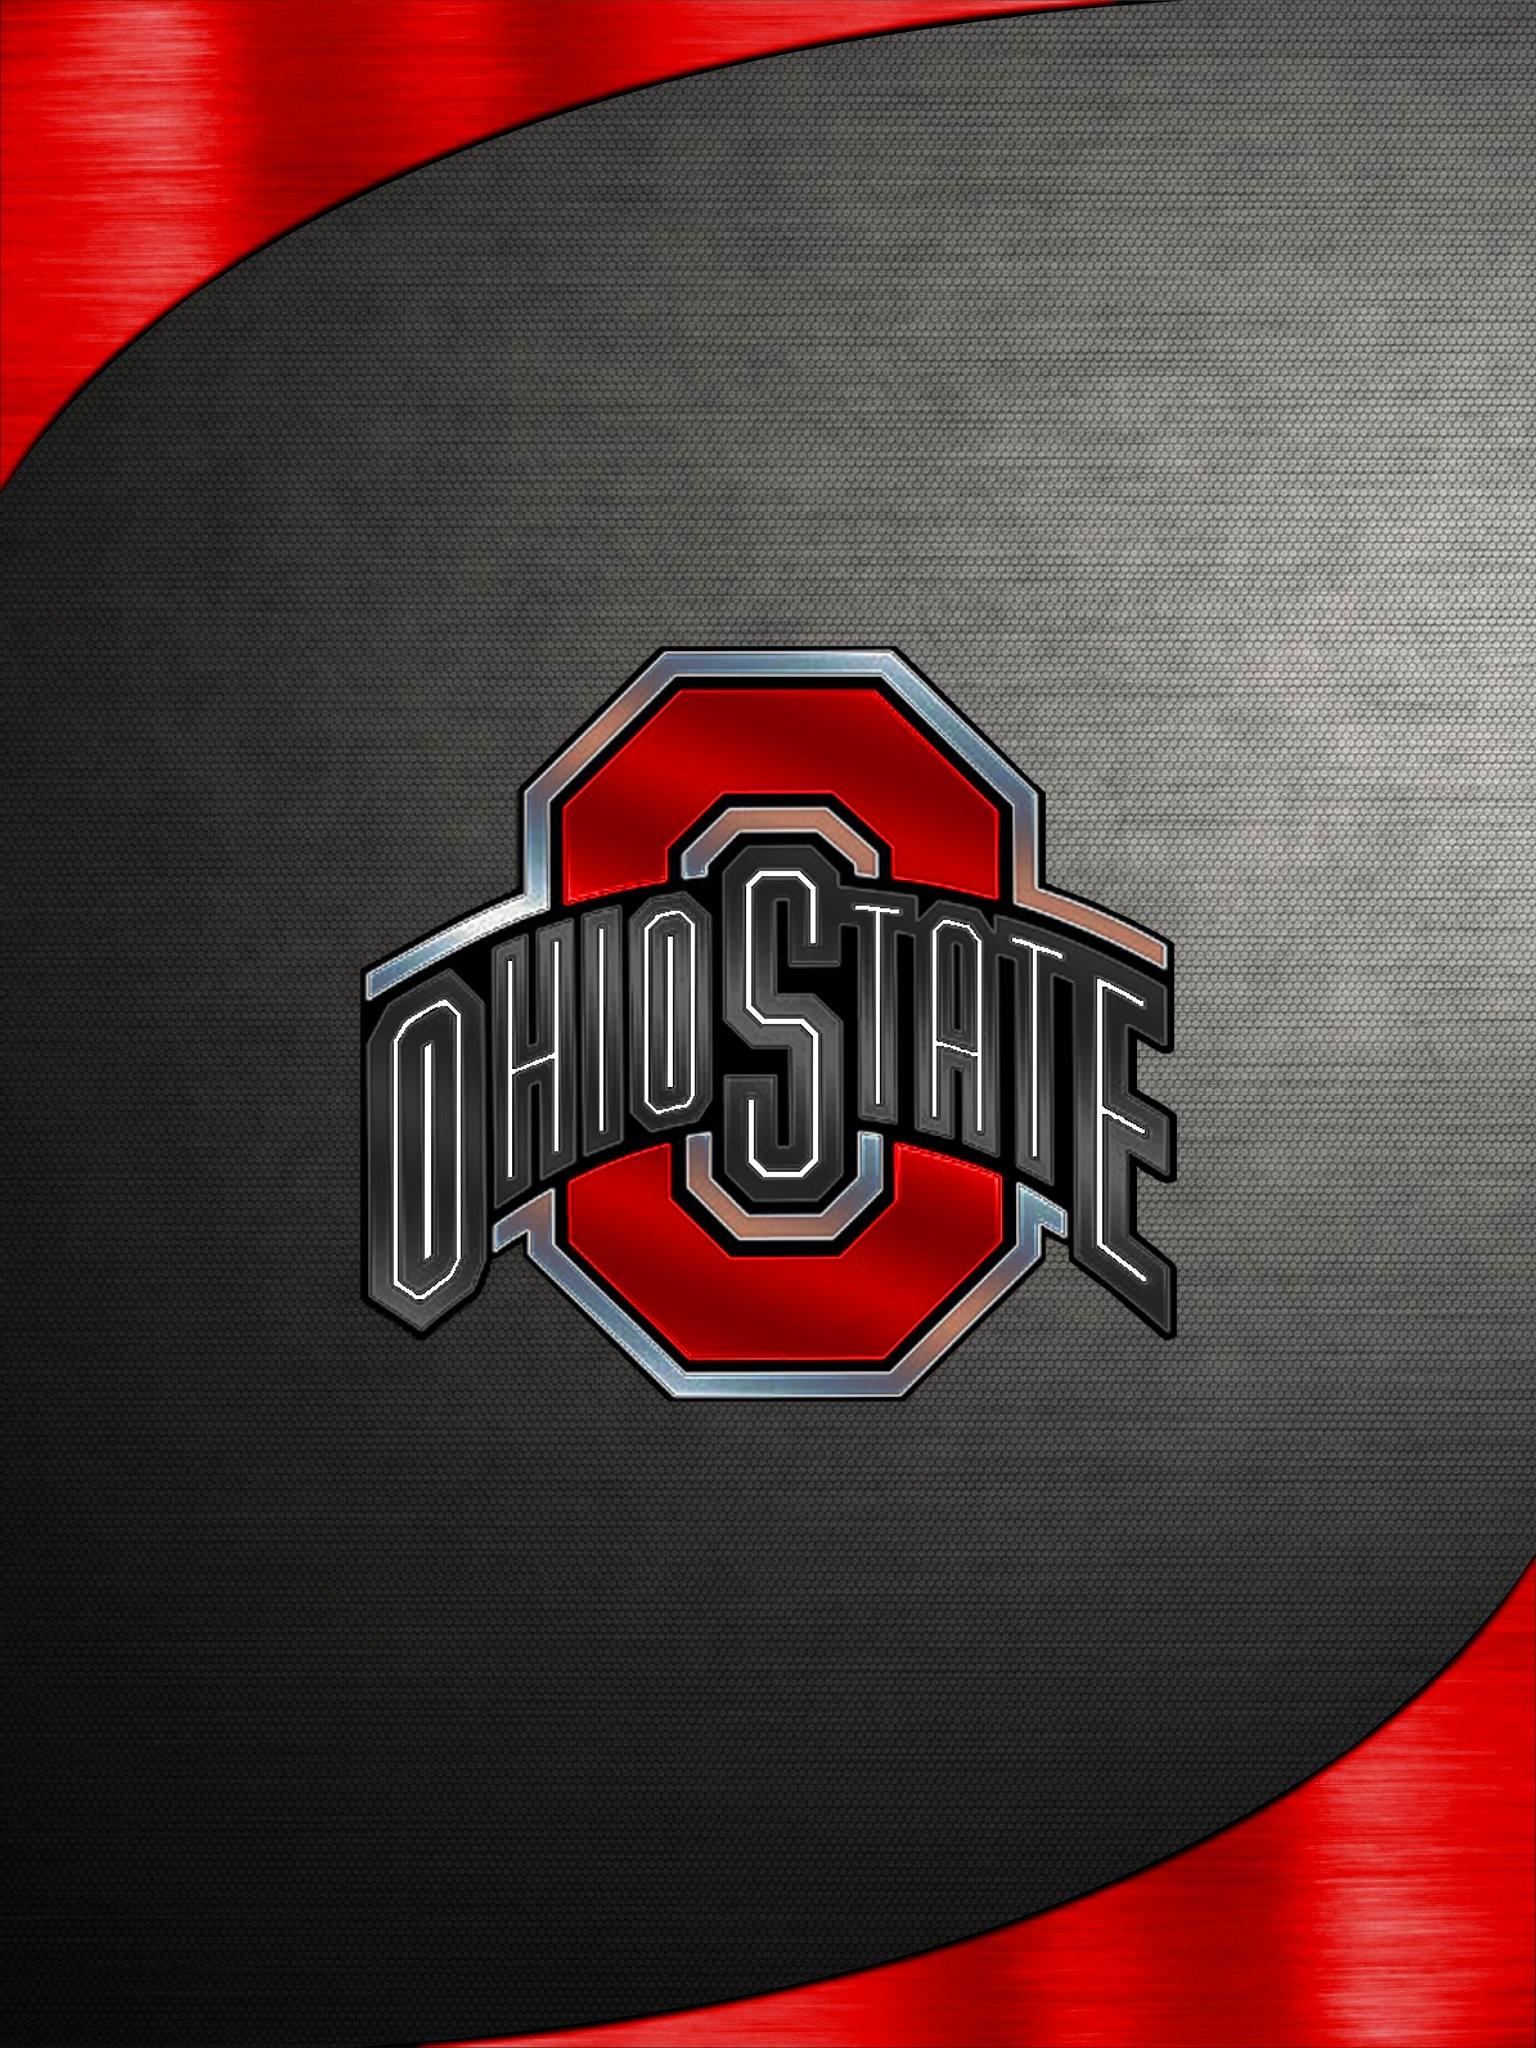 OSU Wallpaper 532 | Ohio State Buckeyes | Pinterest | Wallpaper, Ohio and  Buckeyes